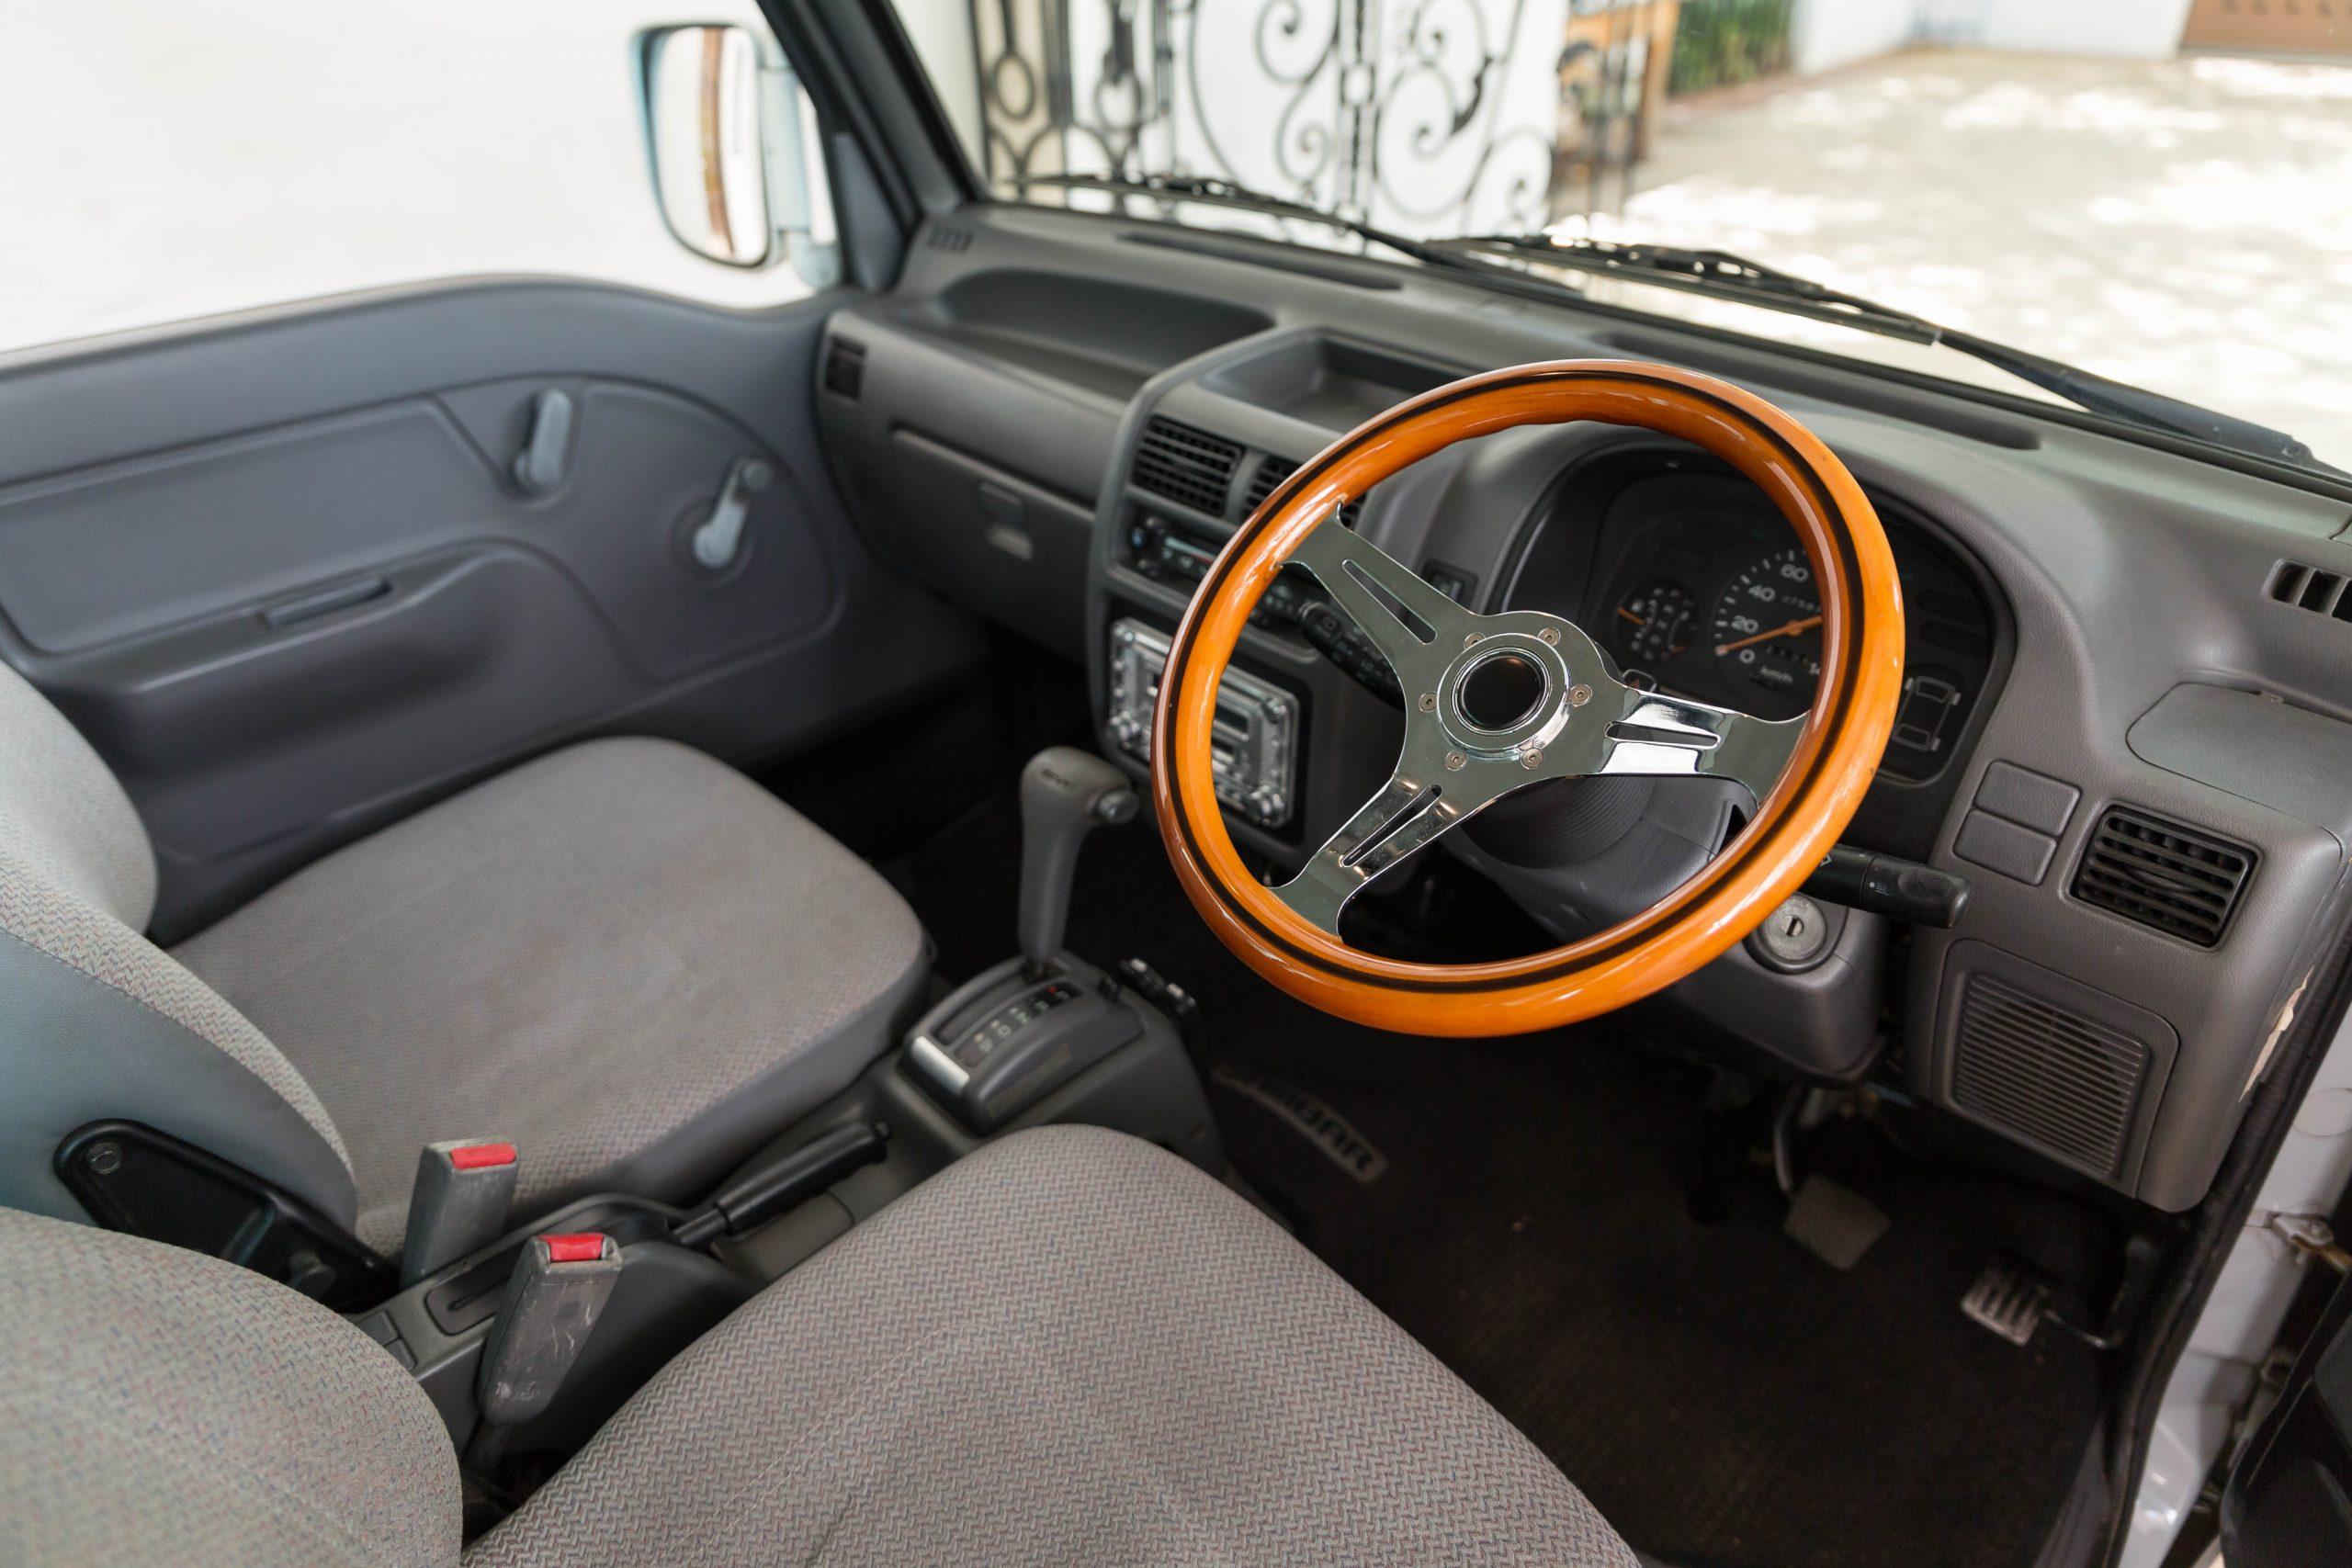 1994-Subaru-Sambar interior